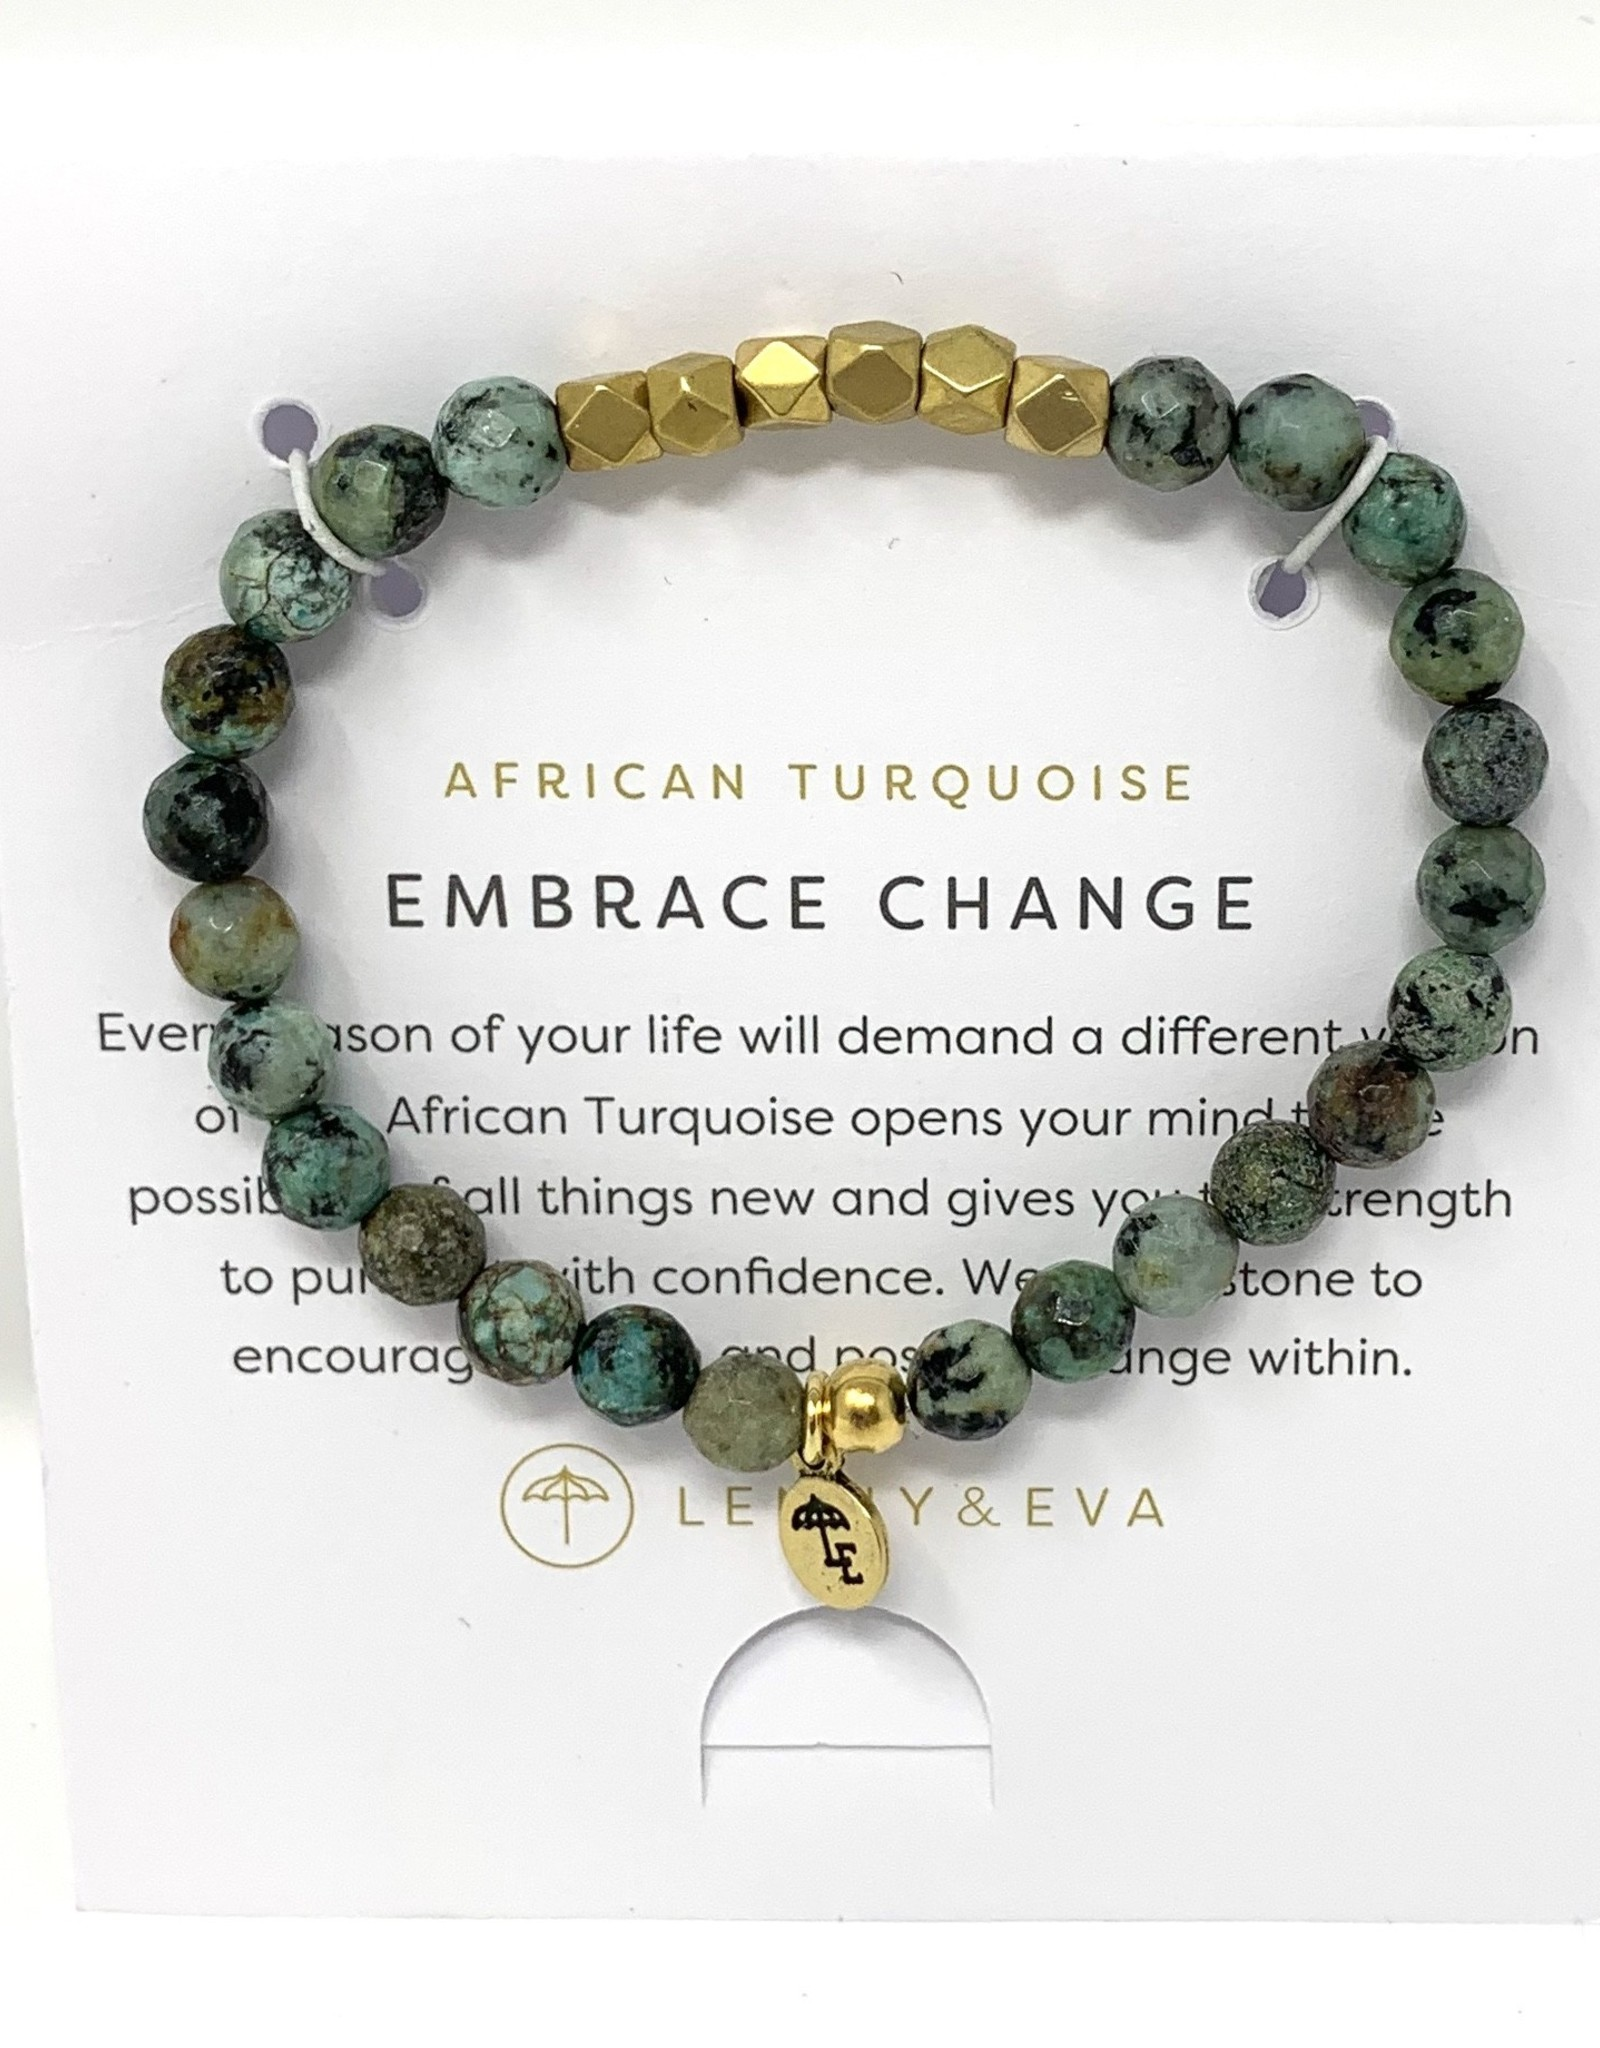 Lenny & Eva Gemstone Bracelet Embrace Change